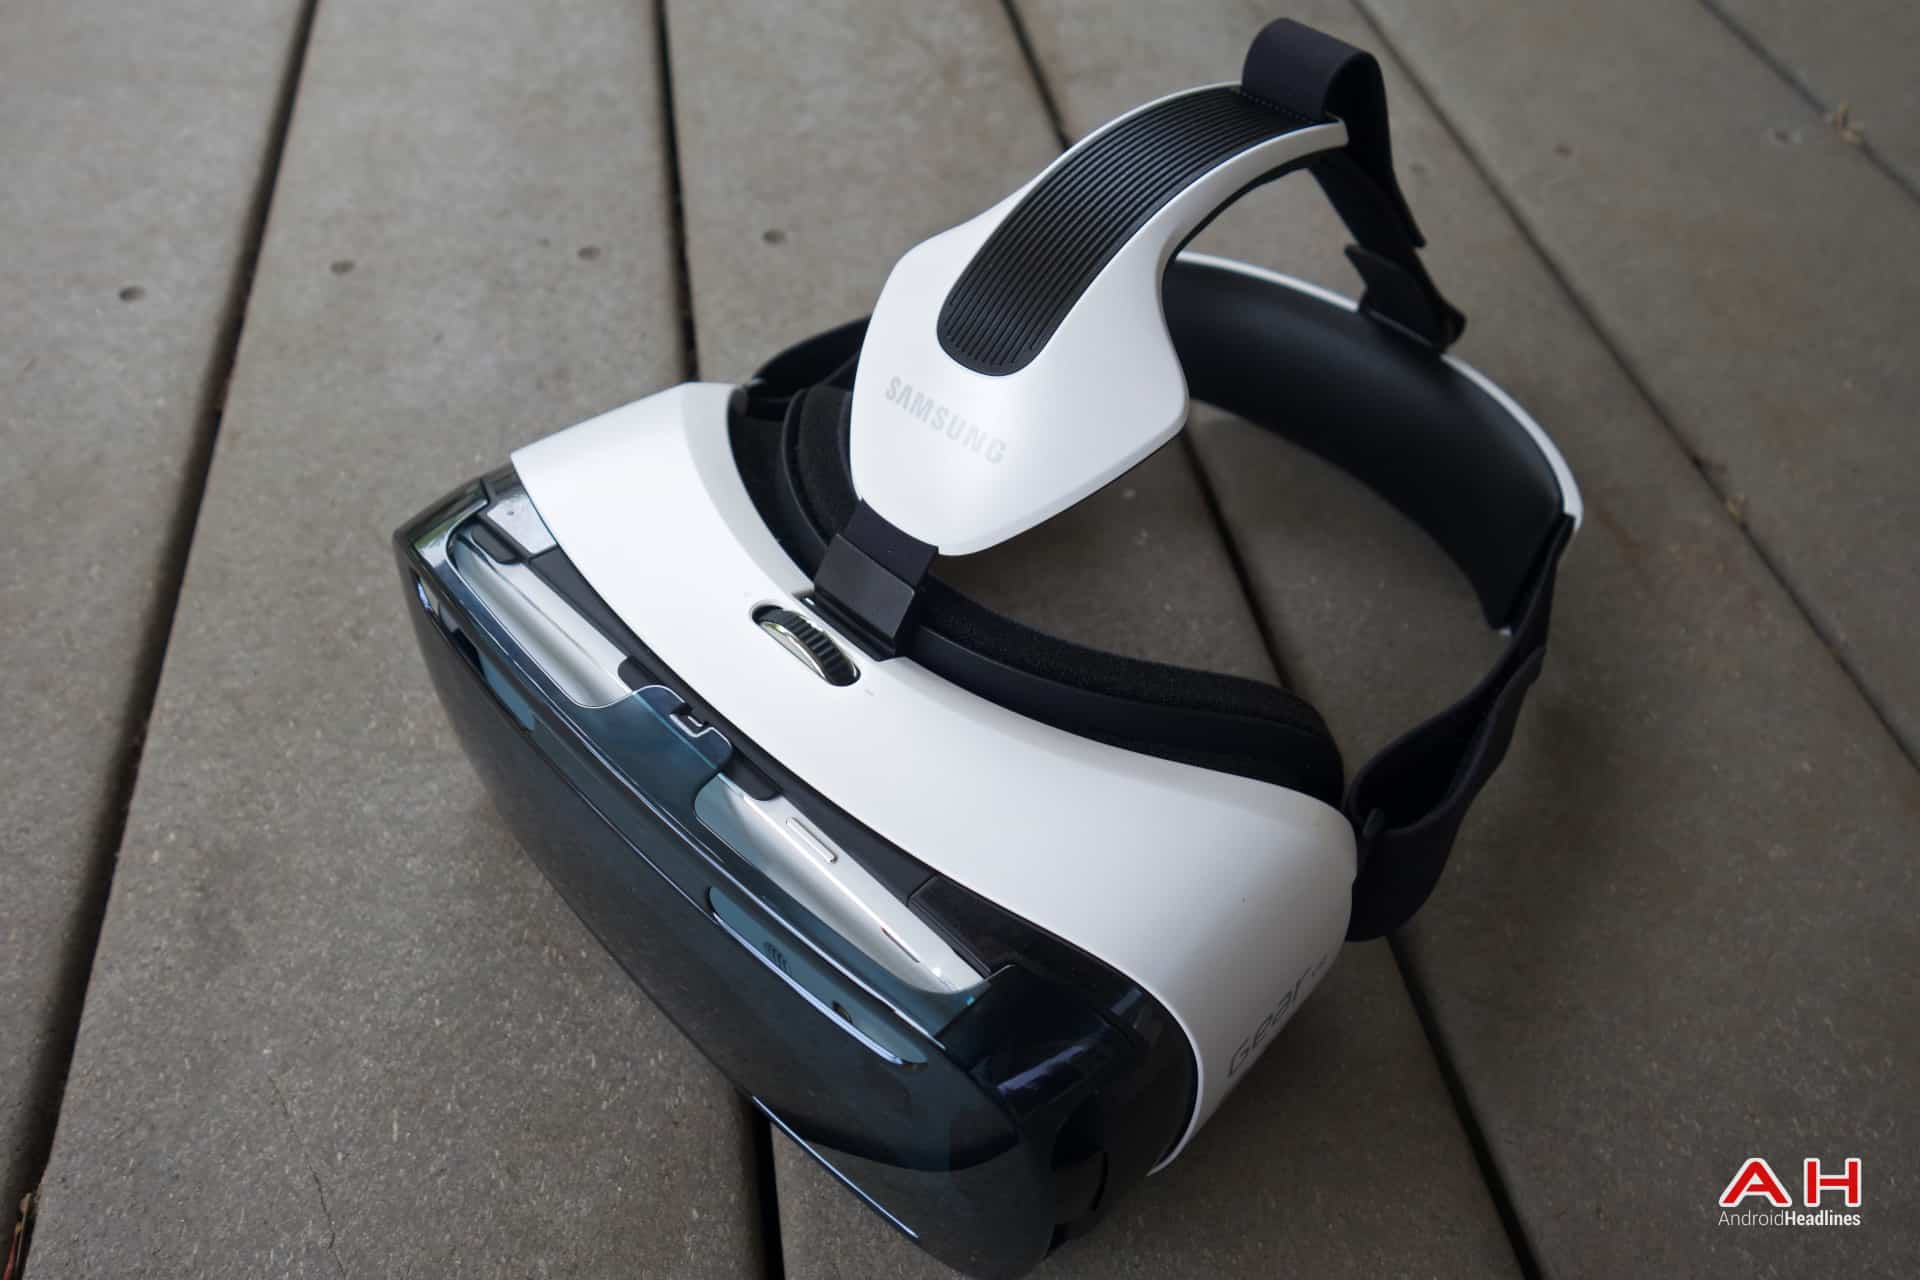 AH Samsung Gear VR-9